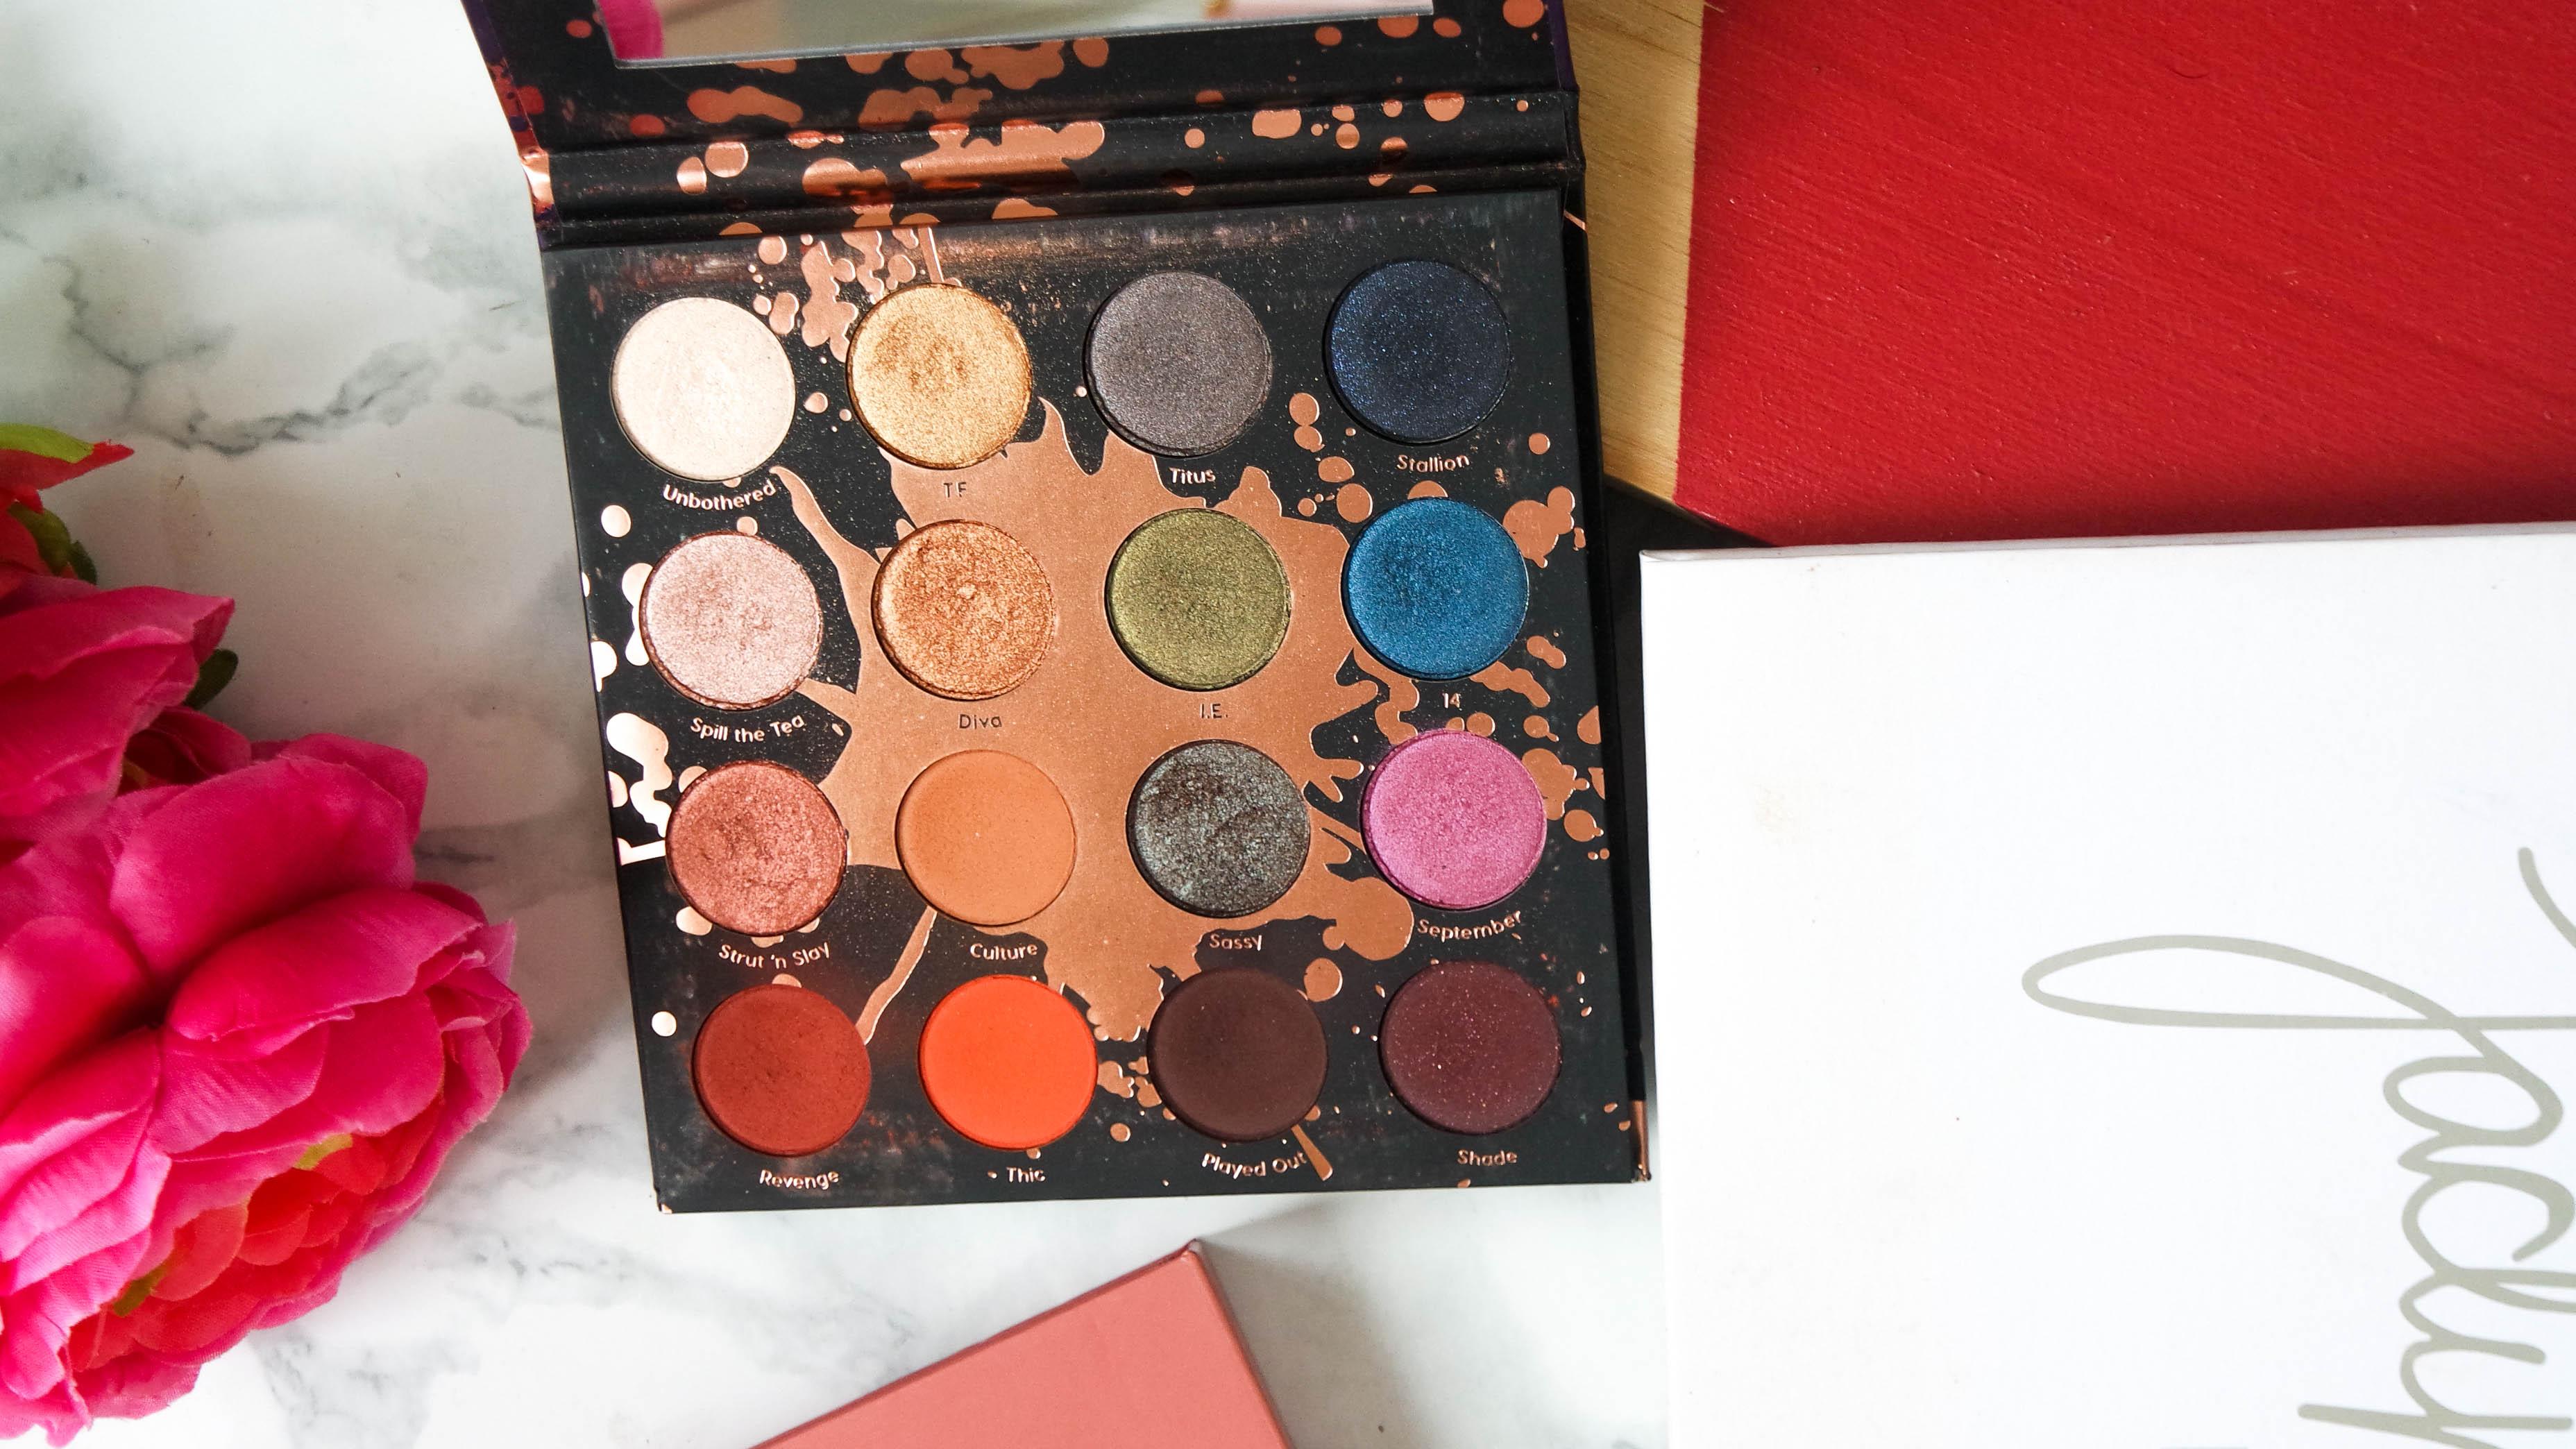 Shayla x Colourpop Perception palette